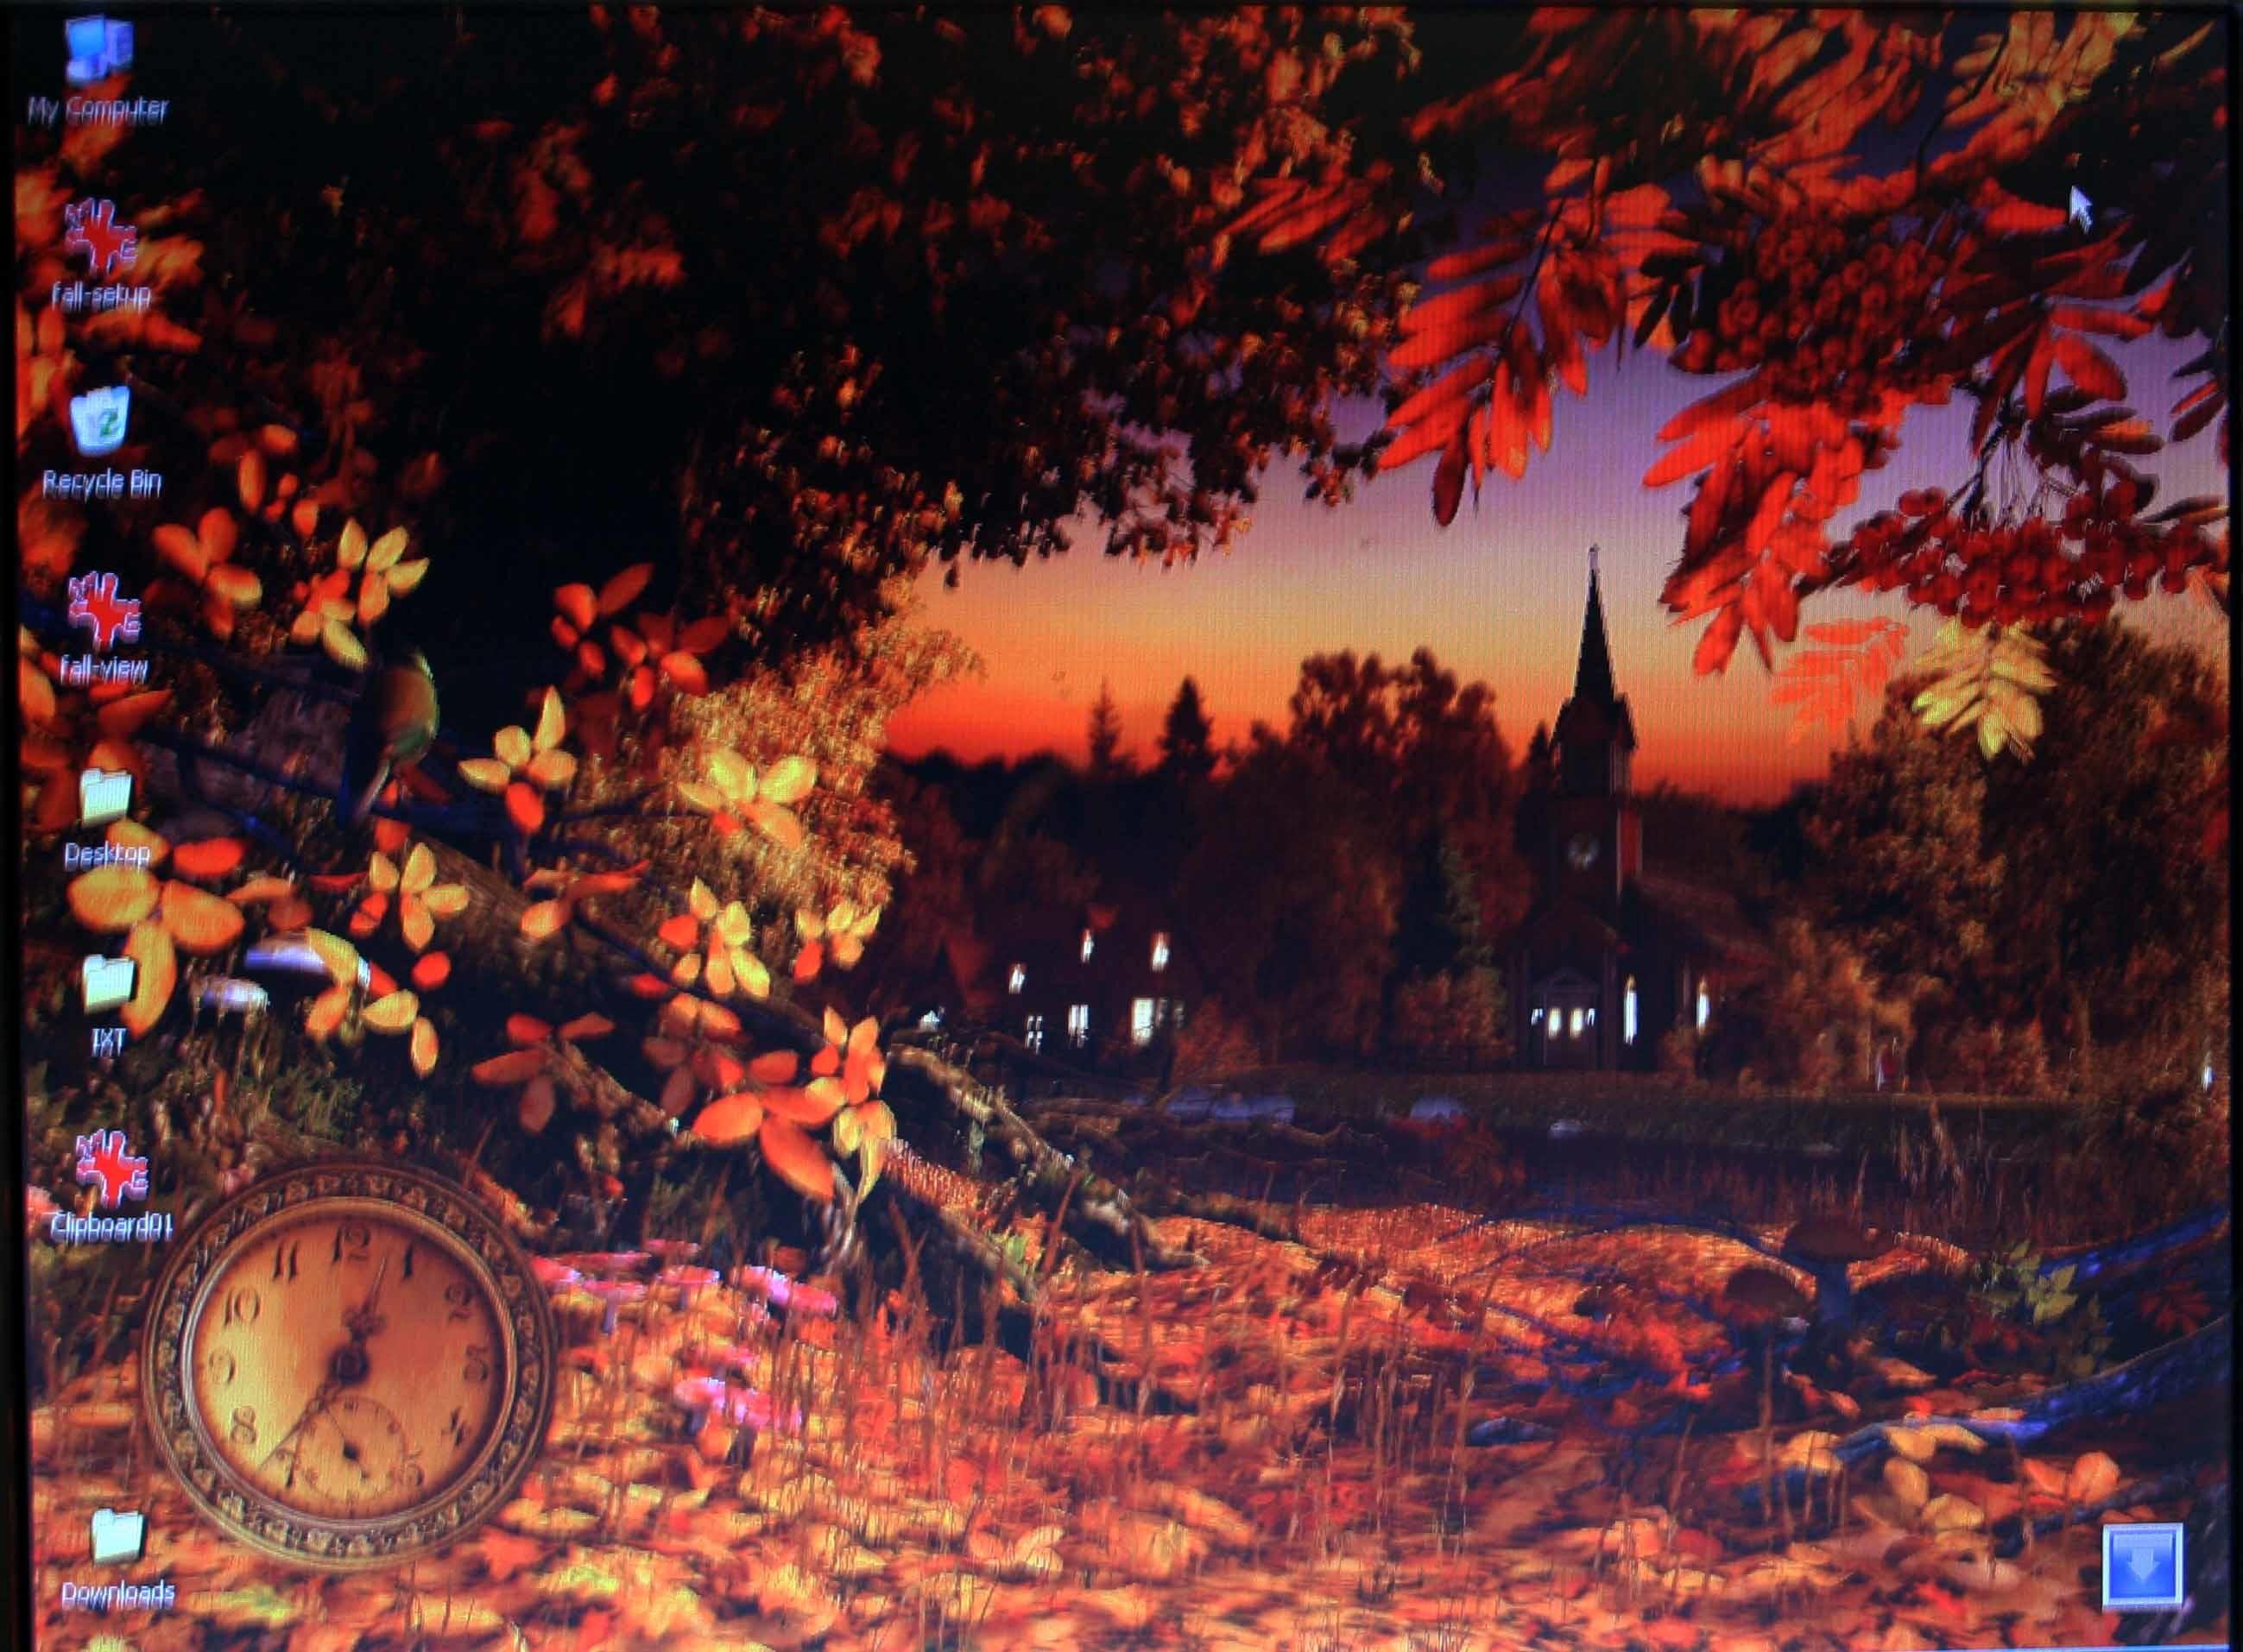 Autumn Wonderland 3D Screensaver and Animated Wallpaper screenshots